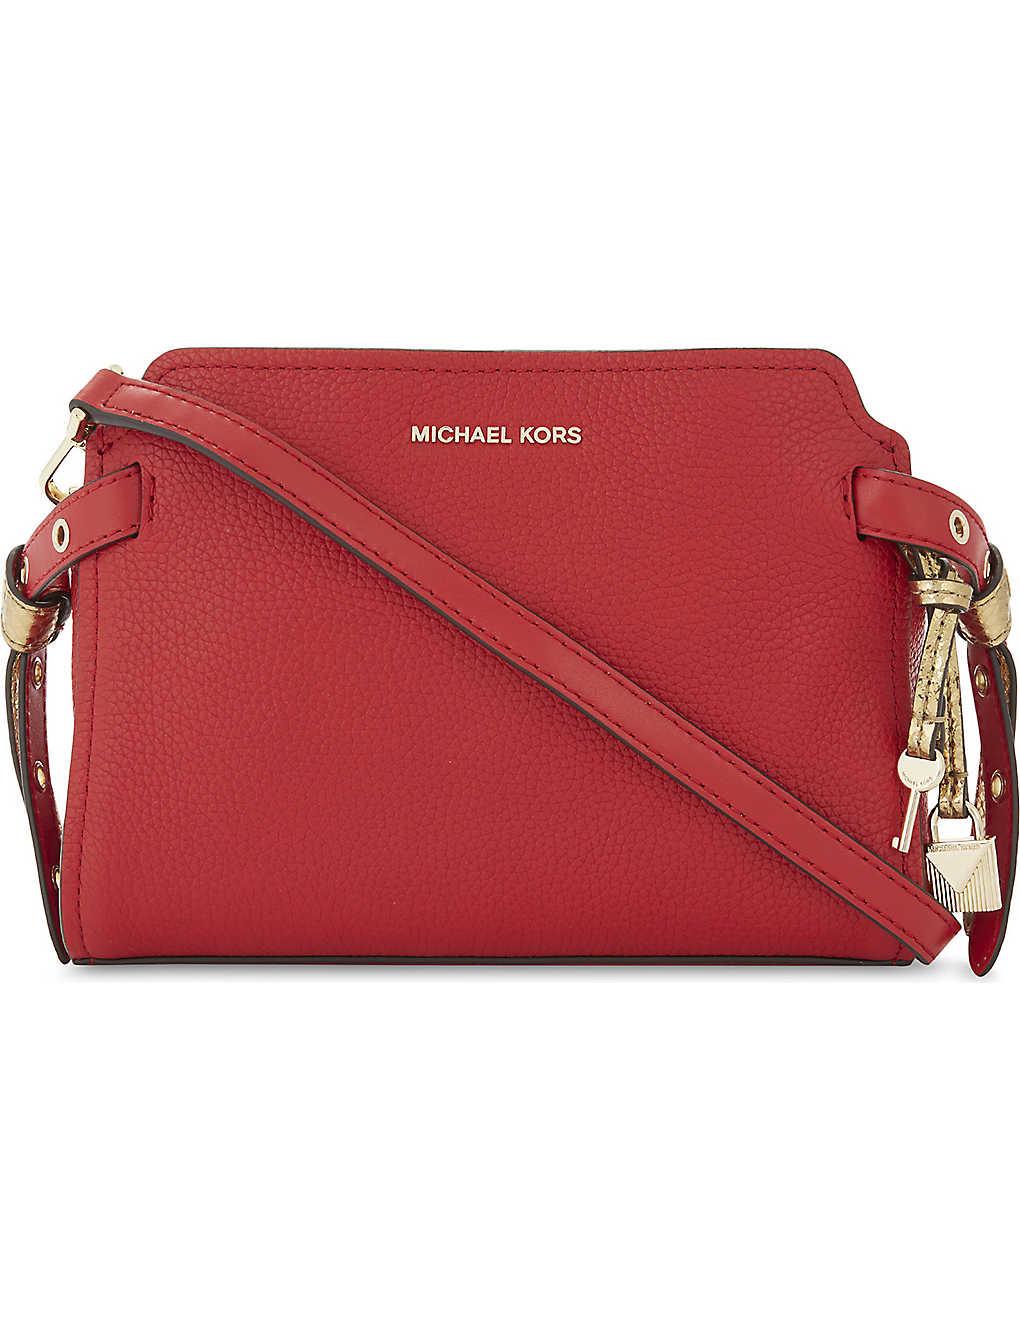 7ce589b2d679 MICHAEL MICHAEL KORS - Bristol leather messenger bag